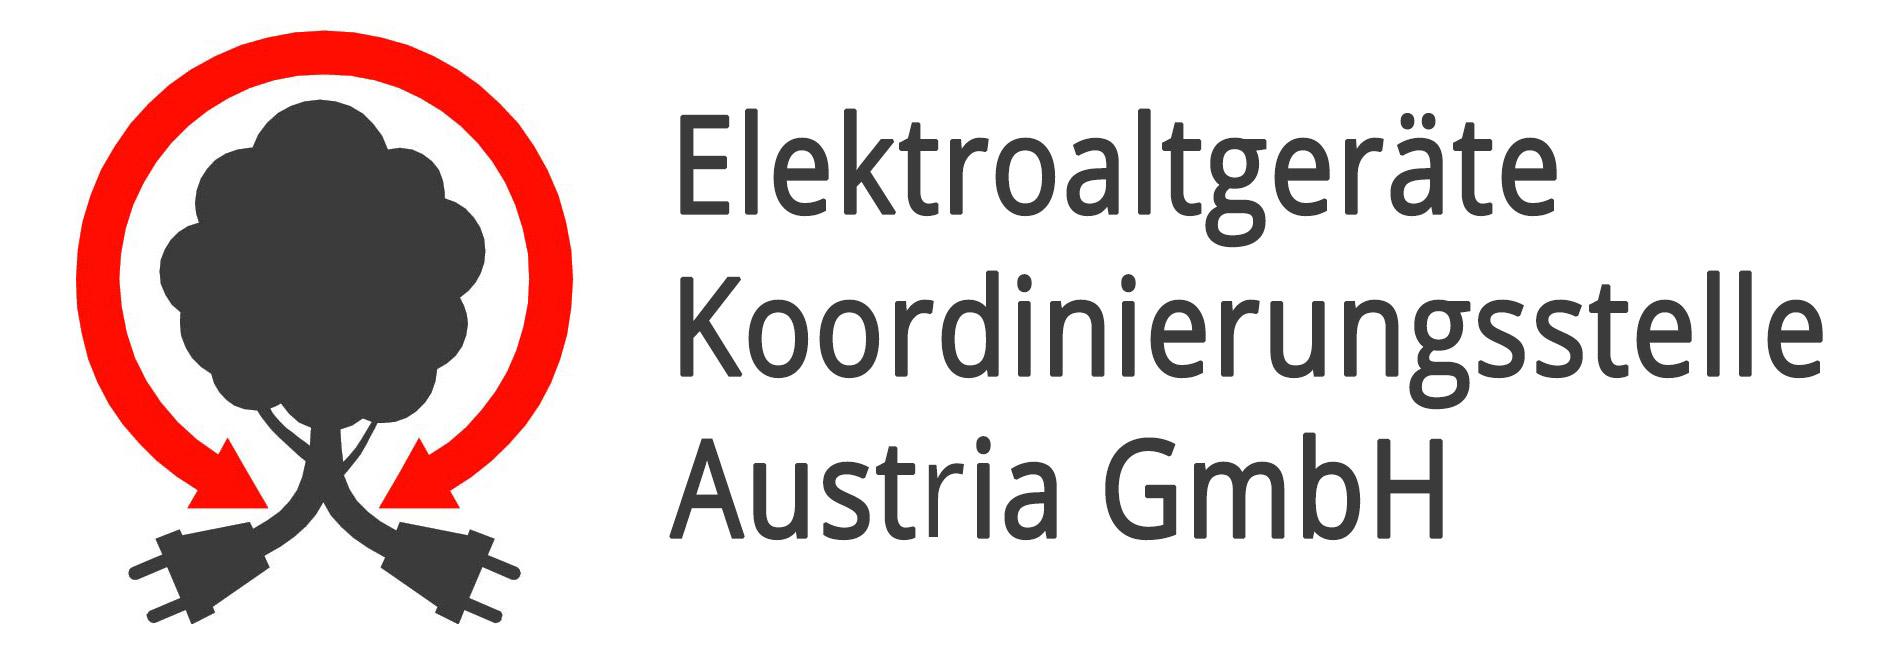 Elektroaltgeräte Koordinierungsstelle Austria GmbH